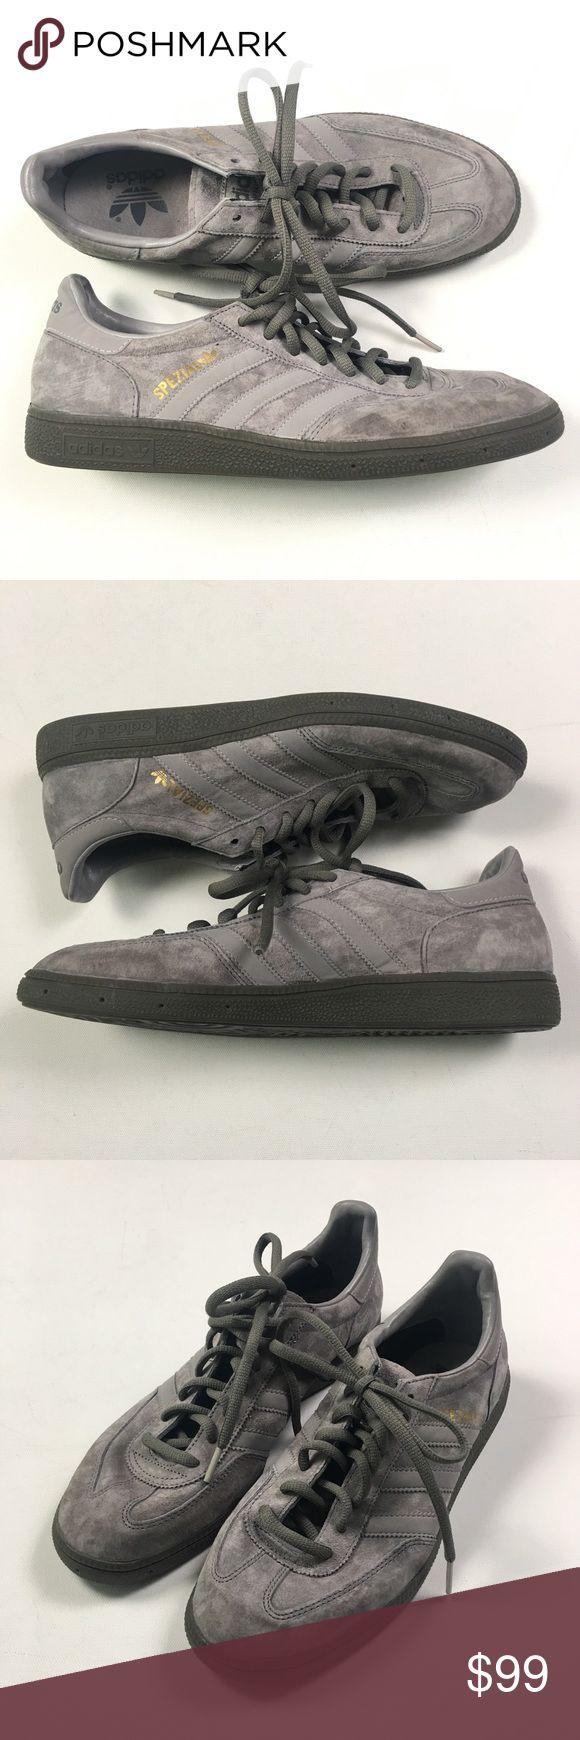 Adidas Spezial Grey Sz L8.5 R9.5 Brand new. Size mismatch. adidas Shoes Sneakers